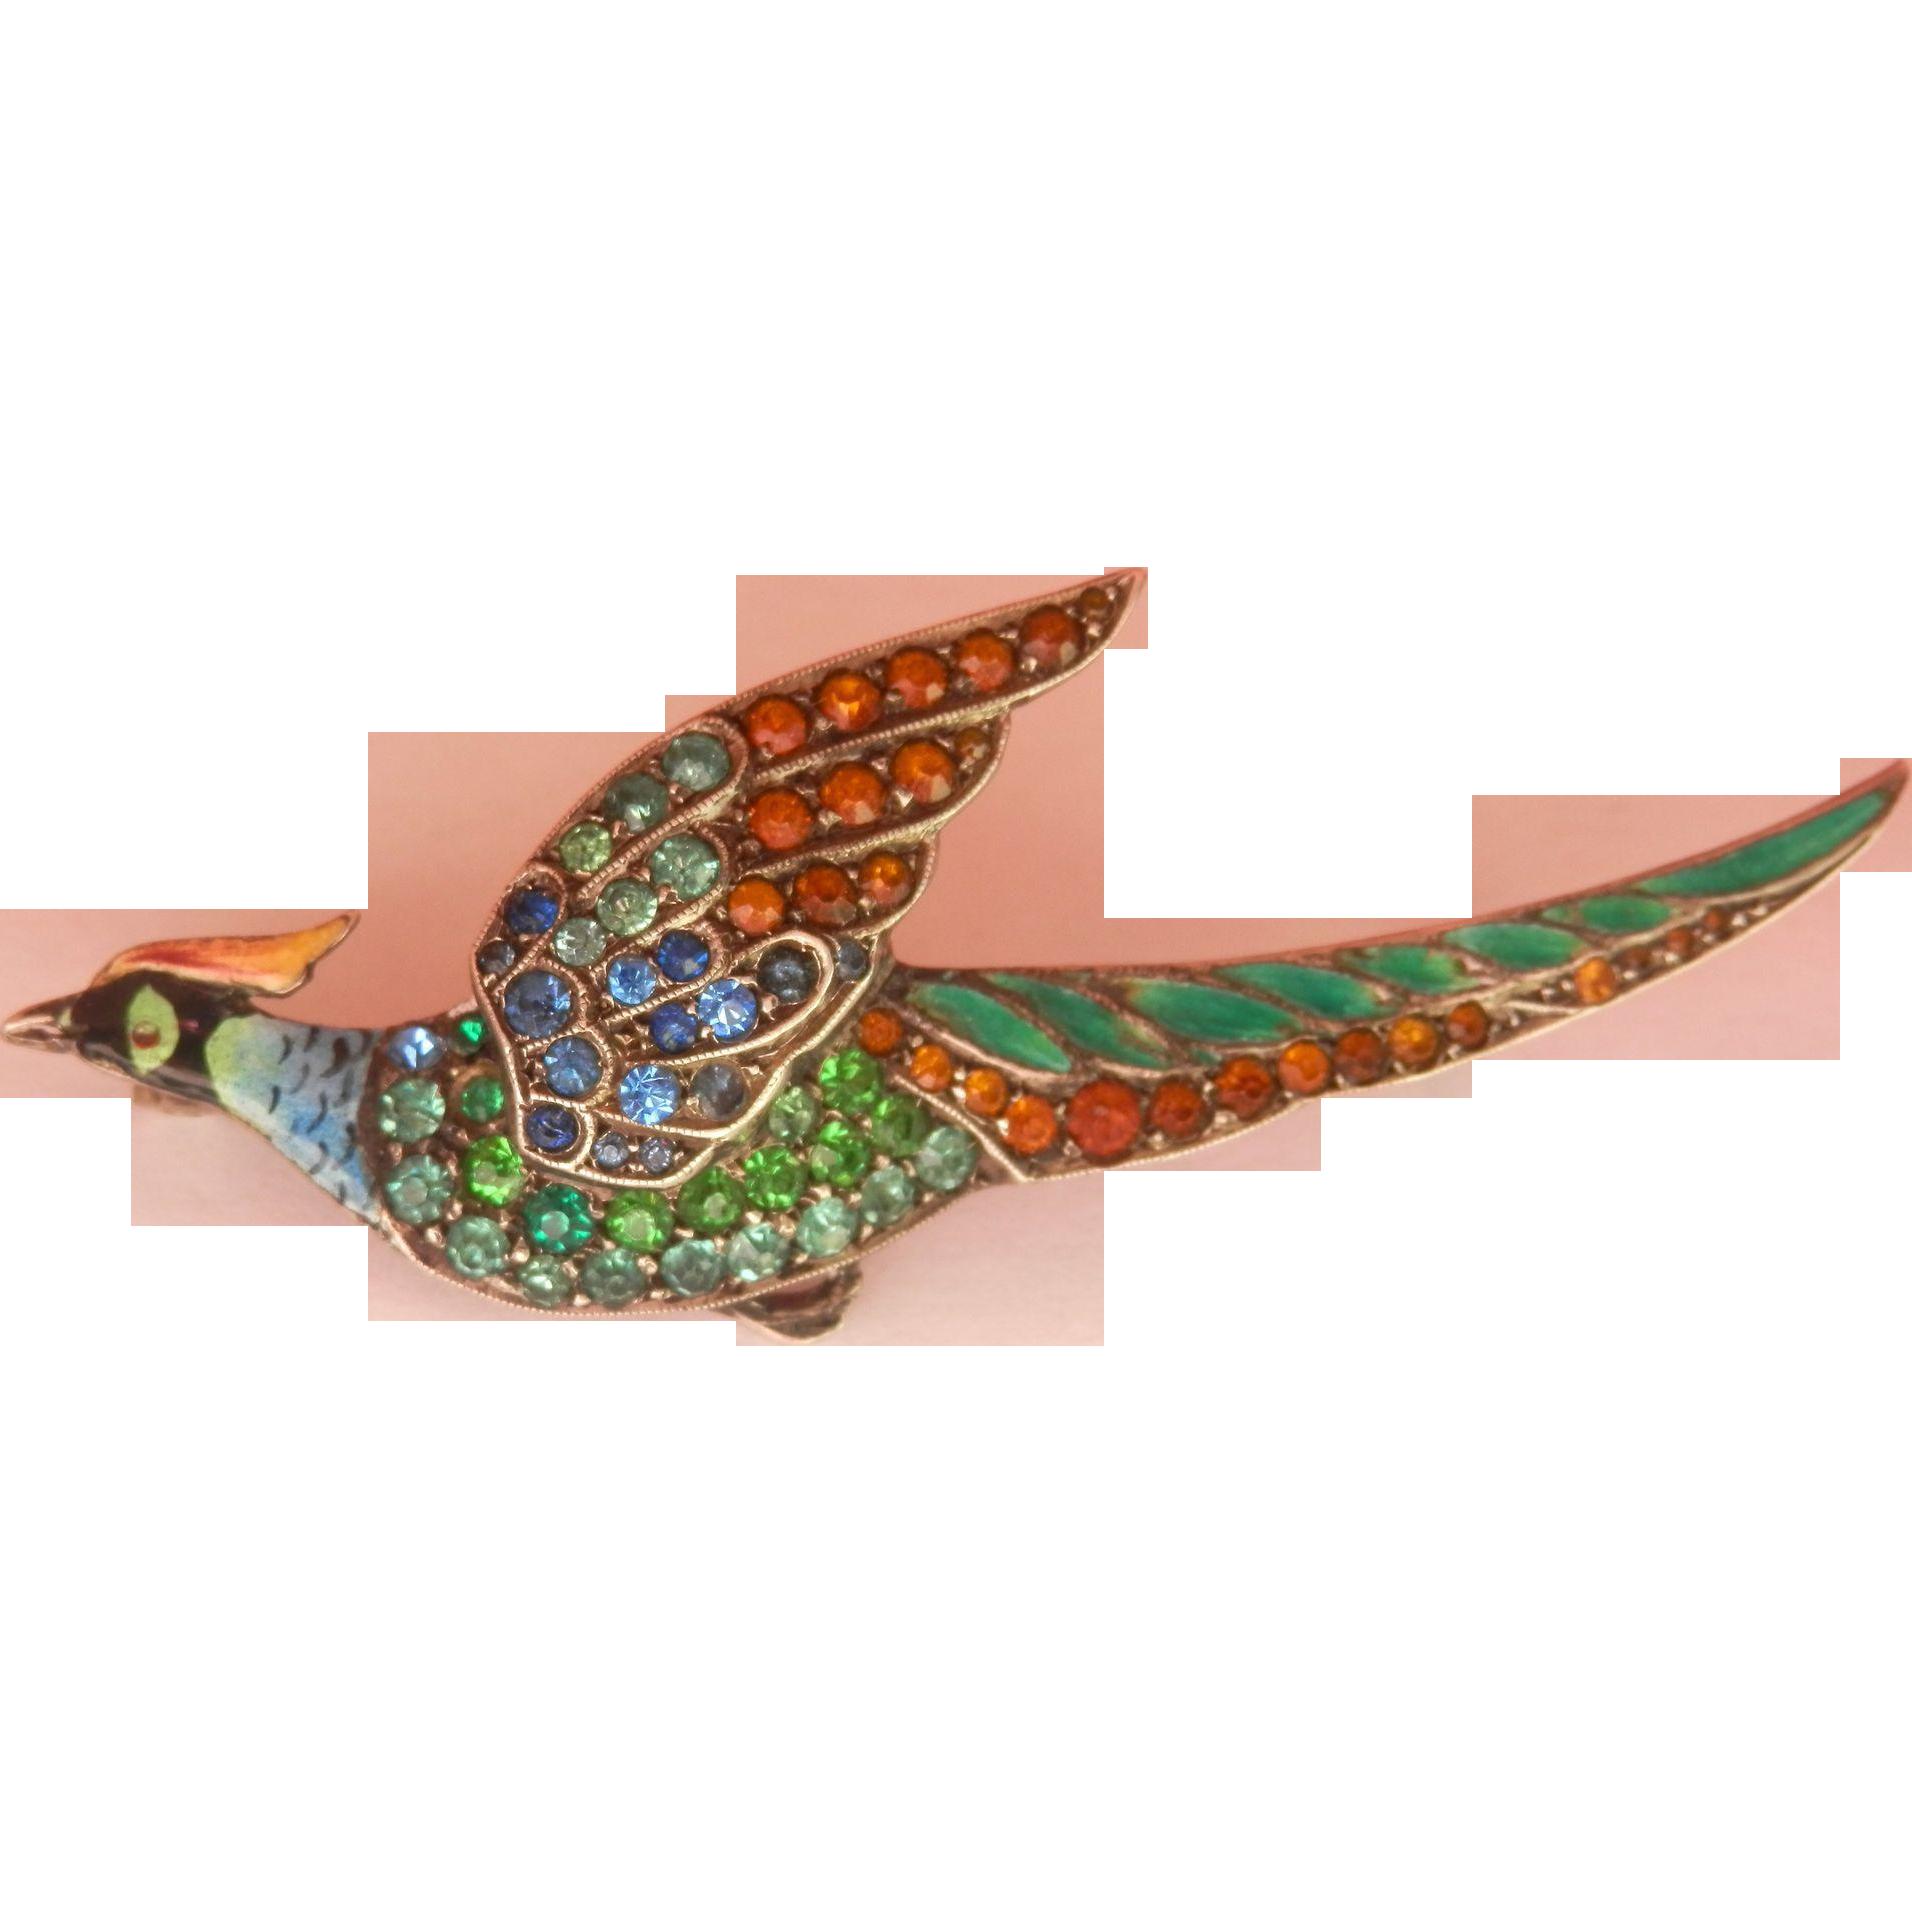 FINAL MARKDOWN! Stunning Antique/Vintage Silver Enamel Pheasant Bird Paste Pin Brooch